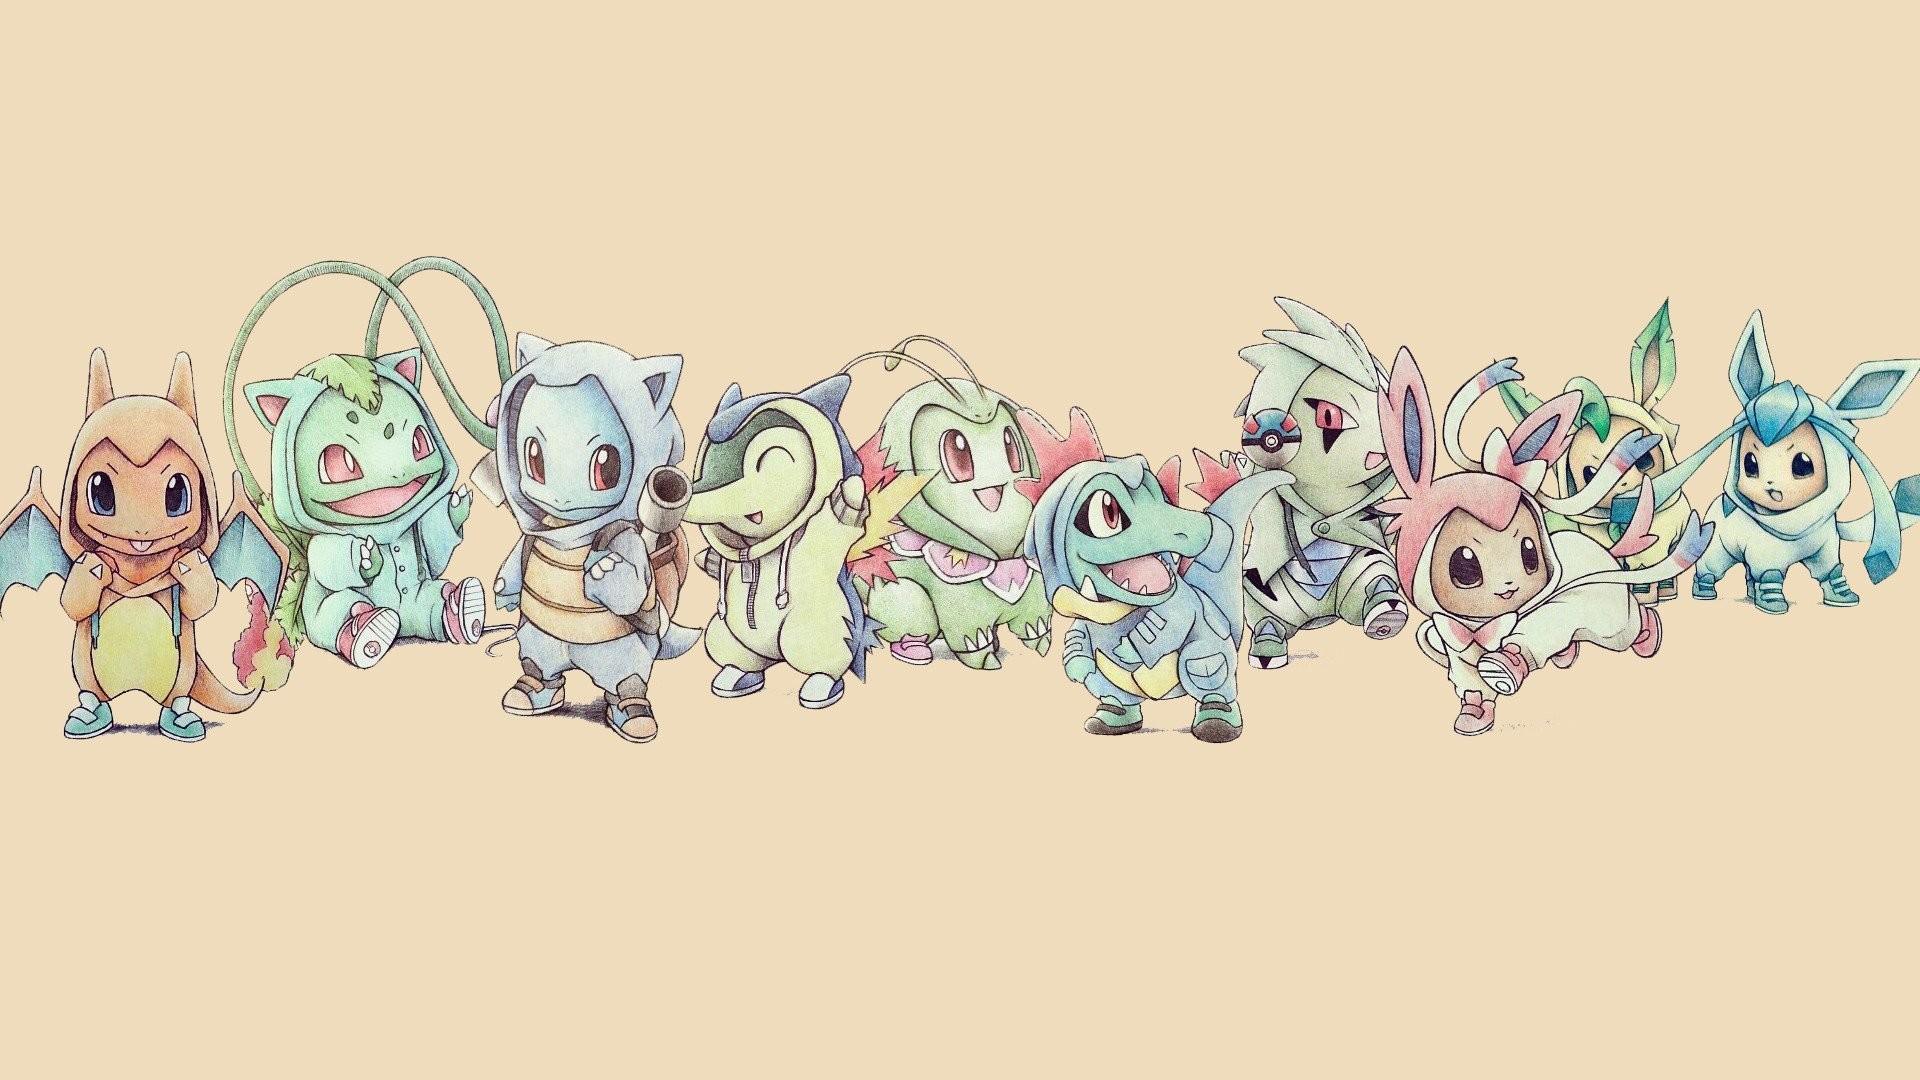 Video Game РPok̩mon Charmander (Pok̩mon) Bulbasaur (Pok̩mon) Squirtle  (Pok̩mon)